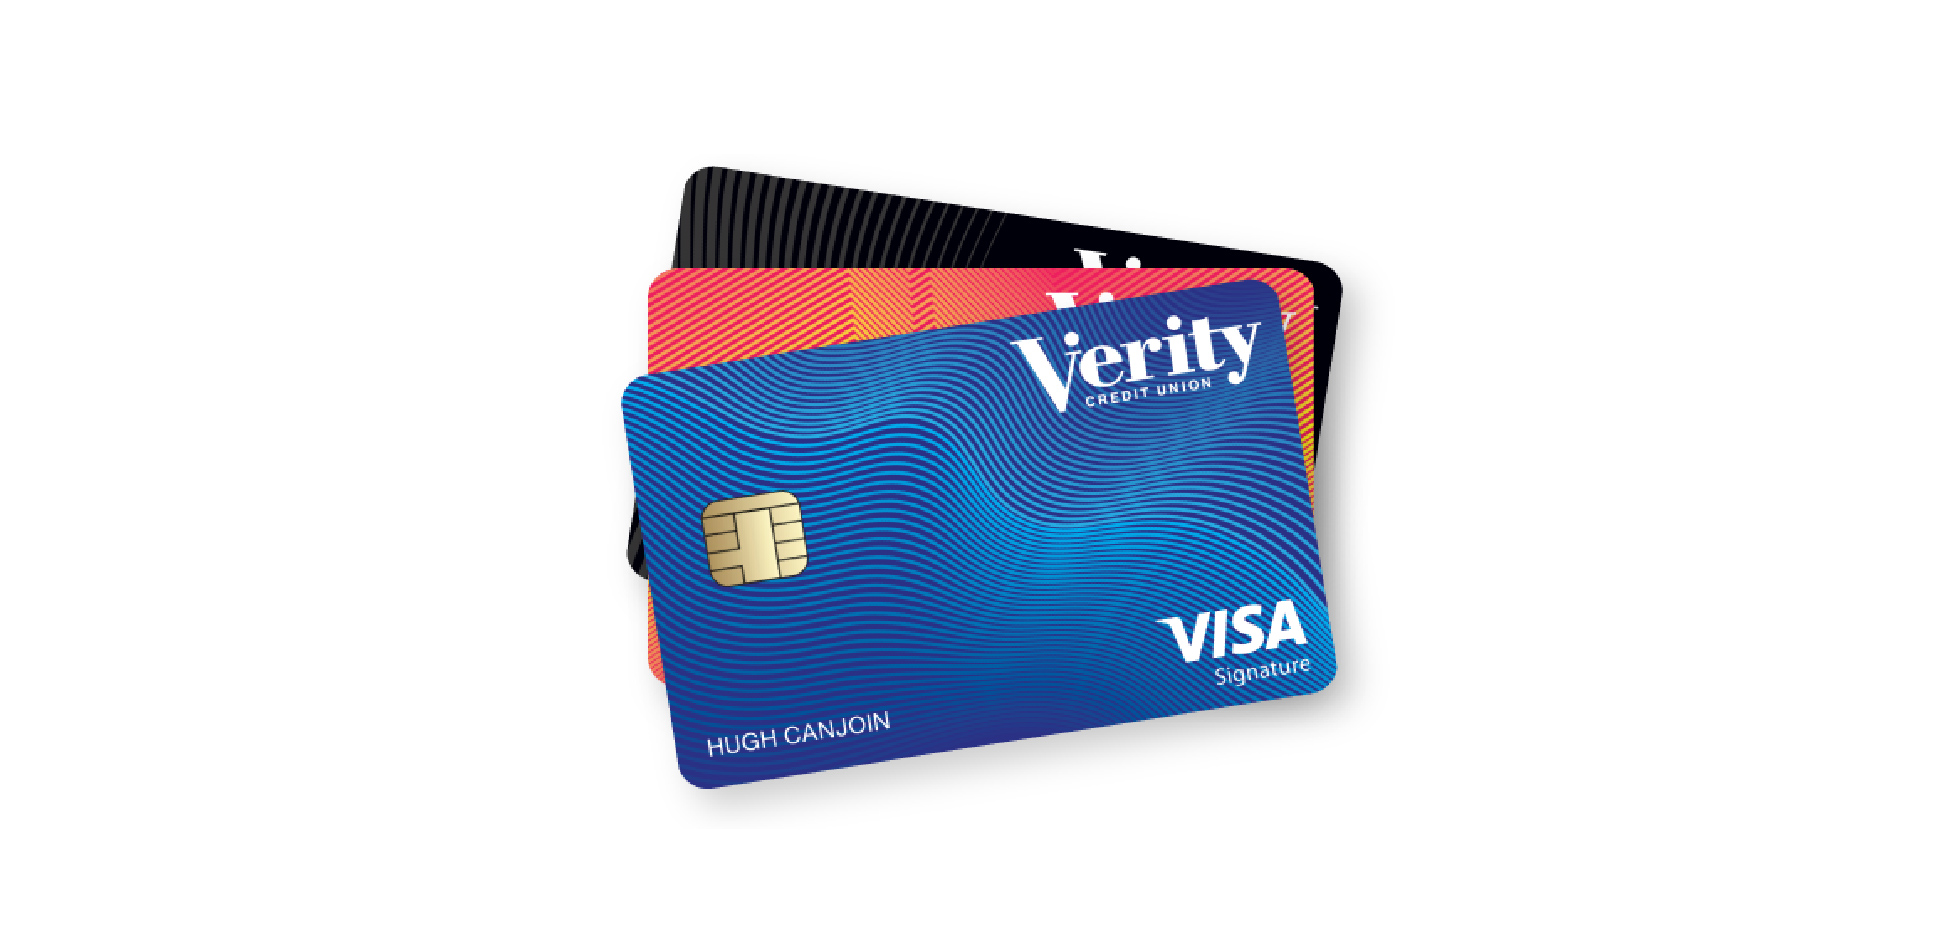 Verity credit cards